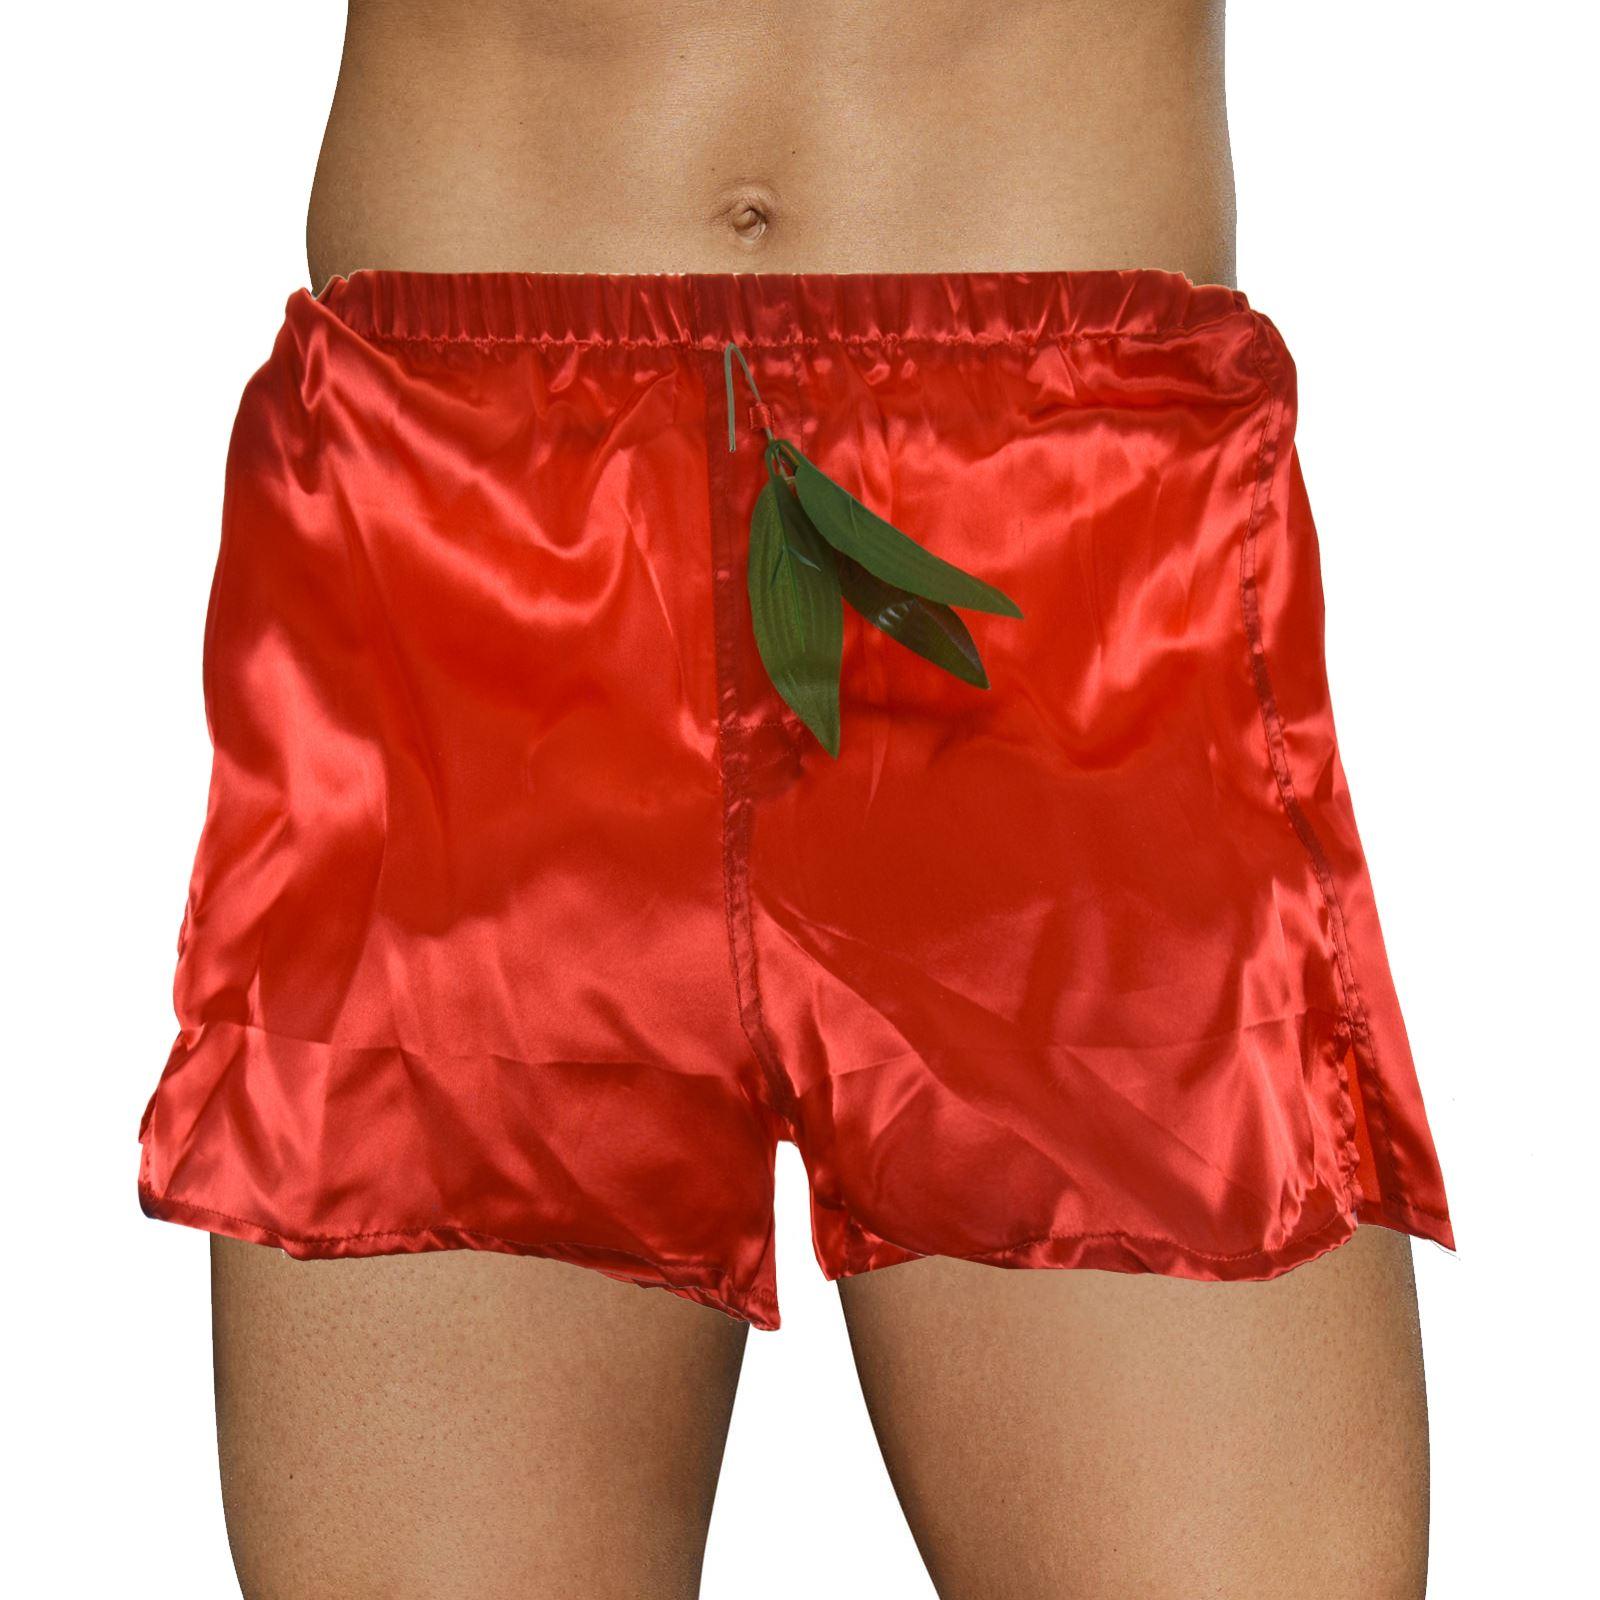 Christmas Novelty Adults Red Satin Boxer Shorts Pants Underwear Xmas Mistletoe   eBay